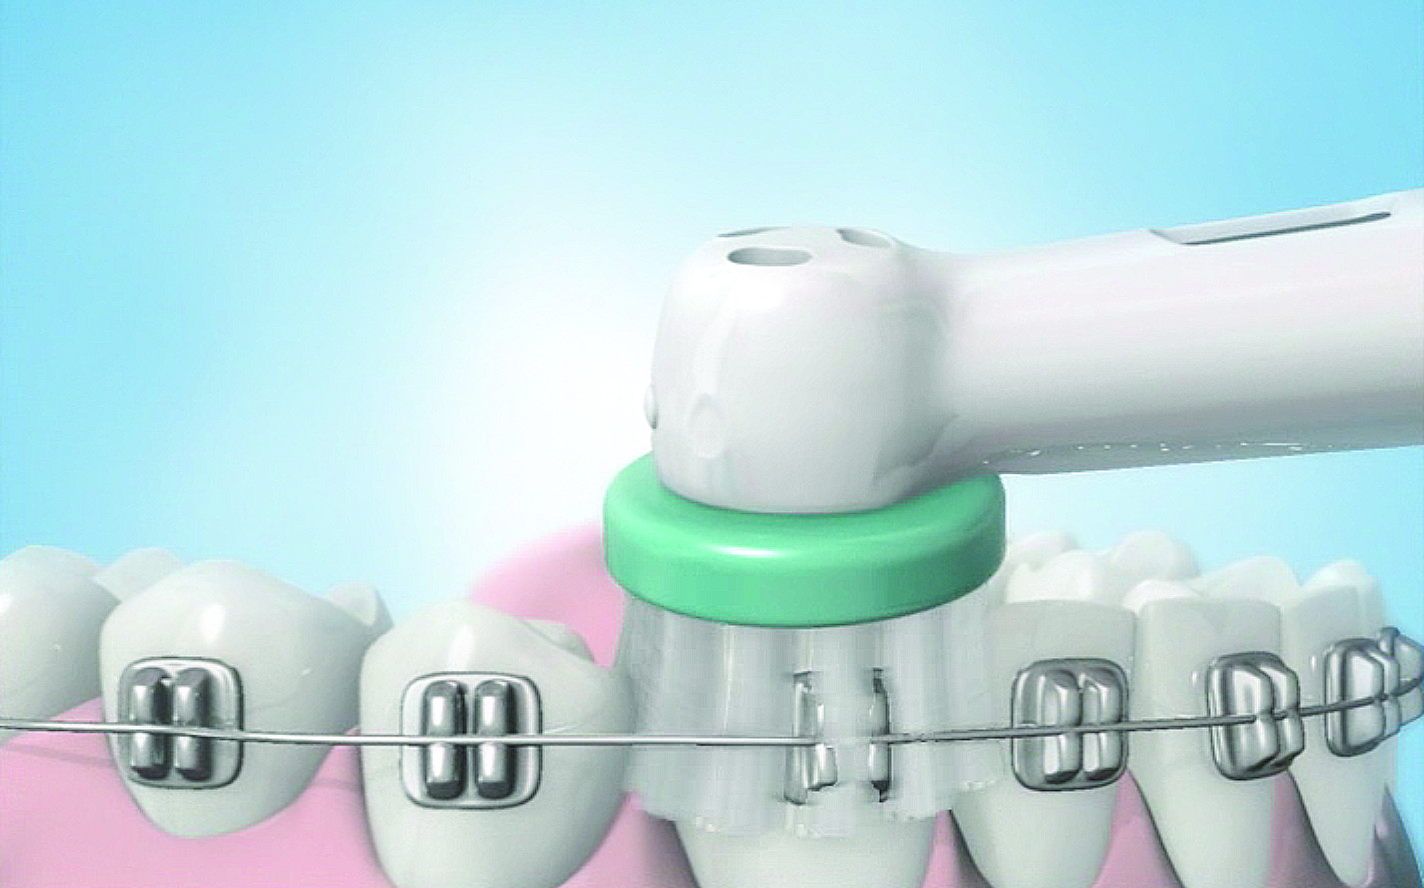 Cabezal-Ortodoncia-Brackets-Cepillo-Electrico-Oral-B